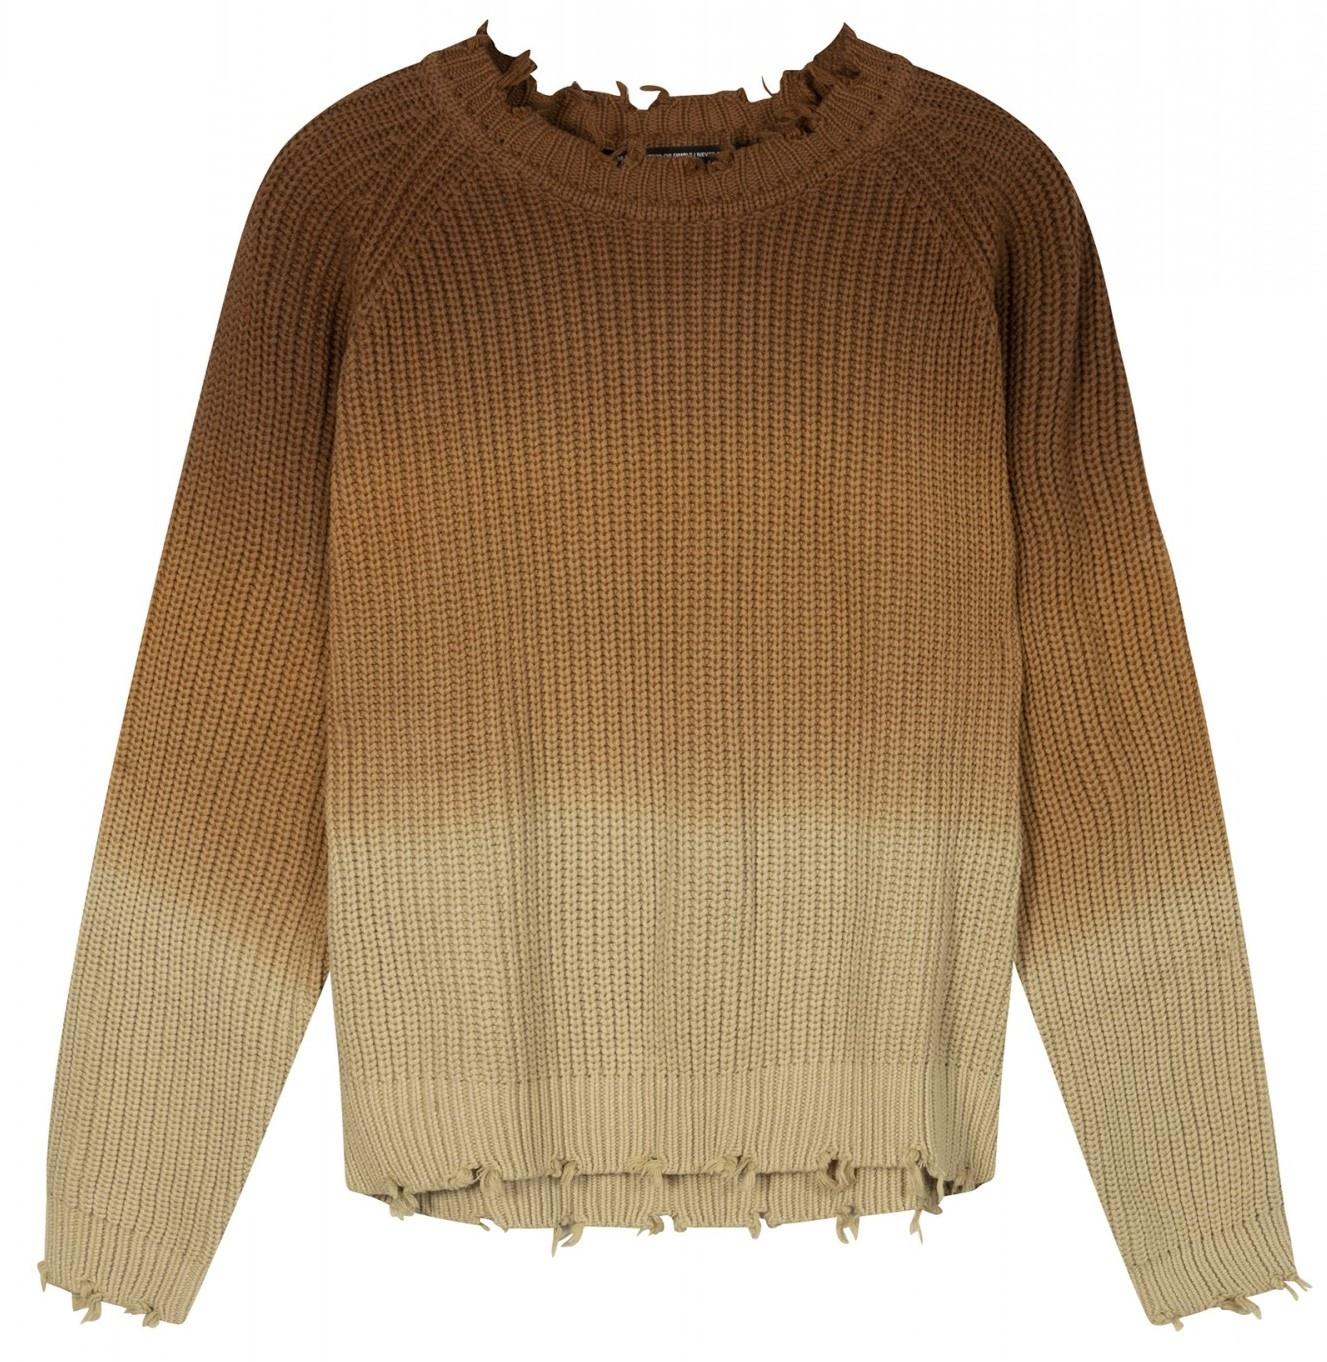 Trui sweater degrade dark caramel-1